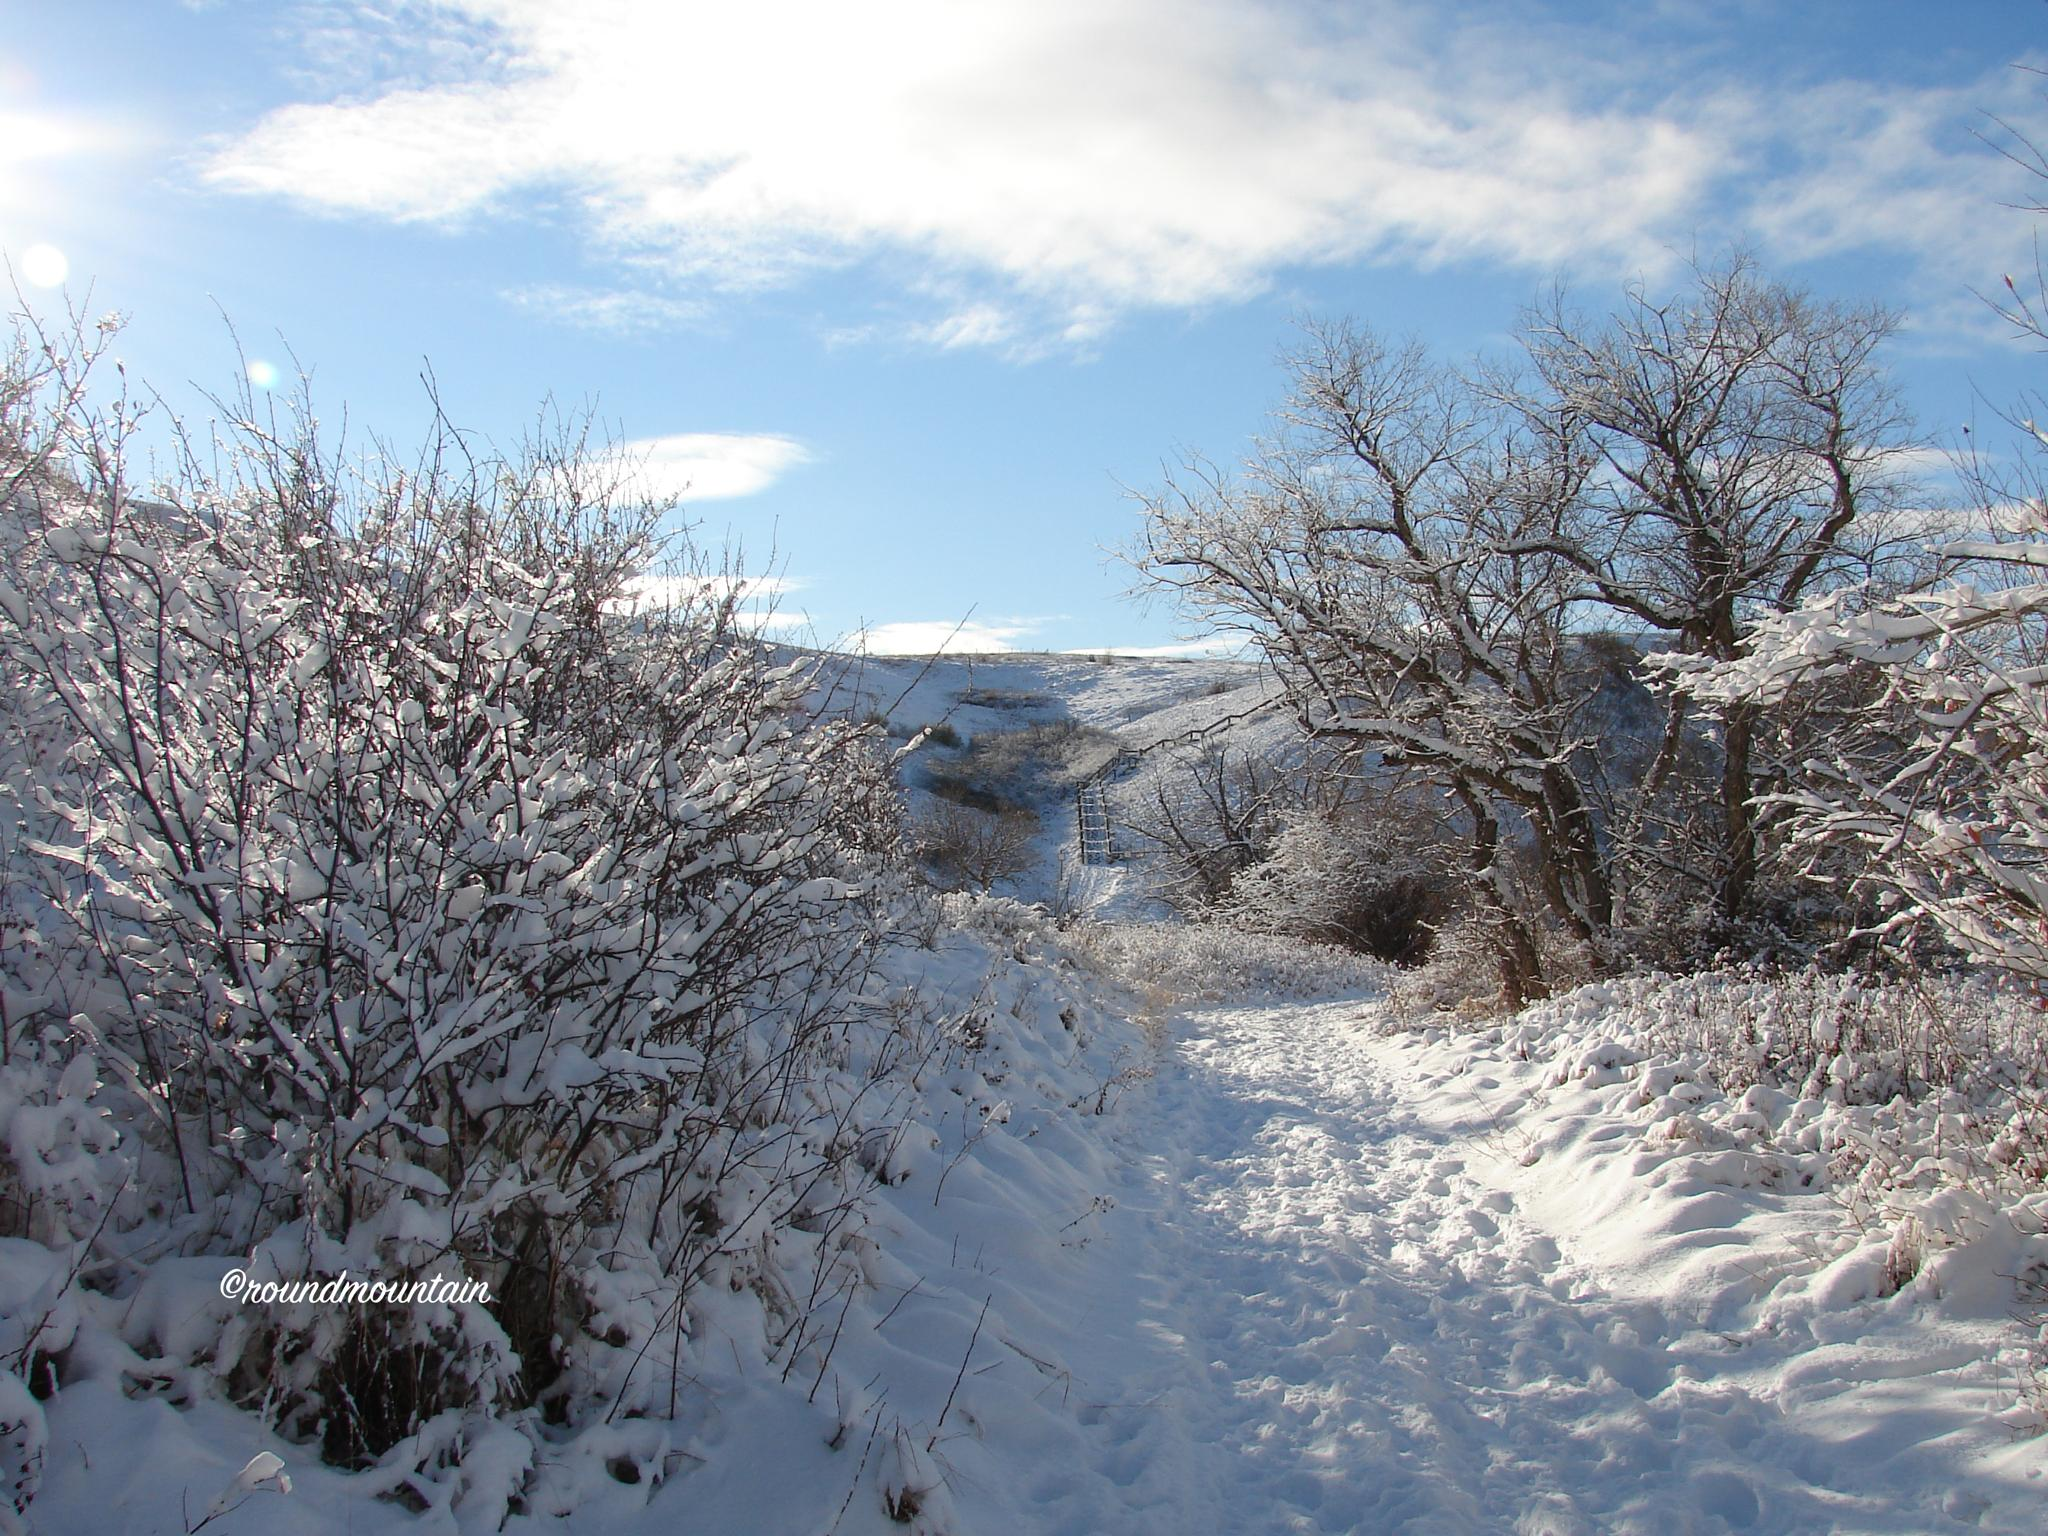 A Winter's Day by rndmtn